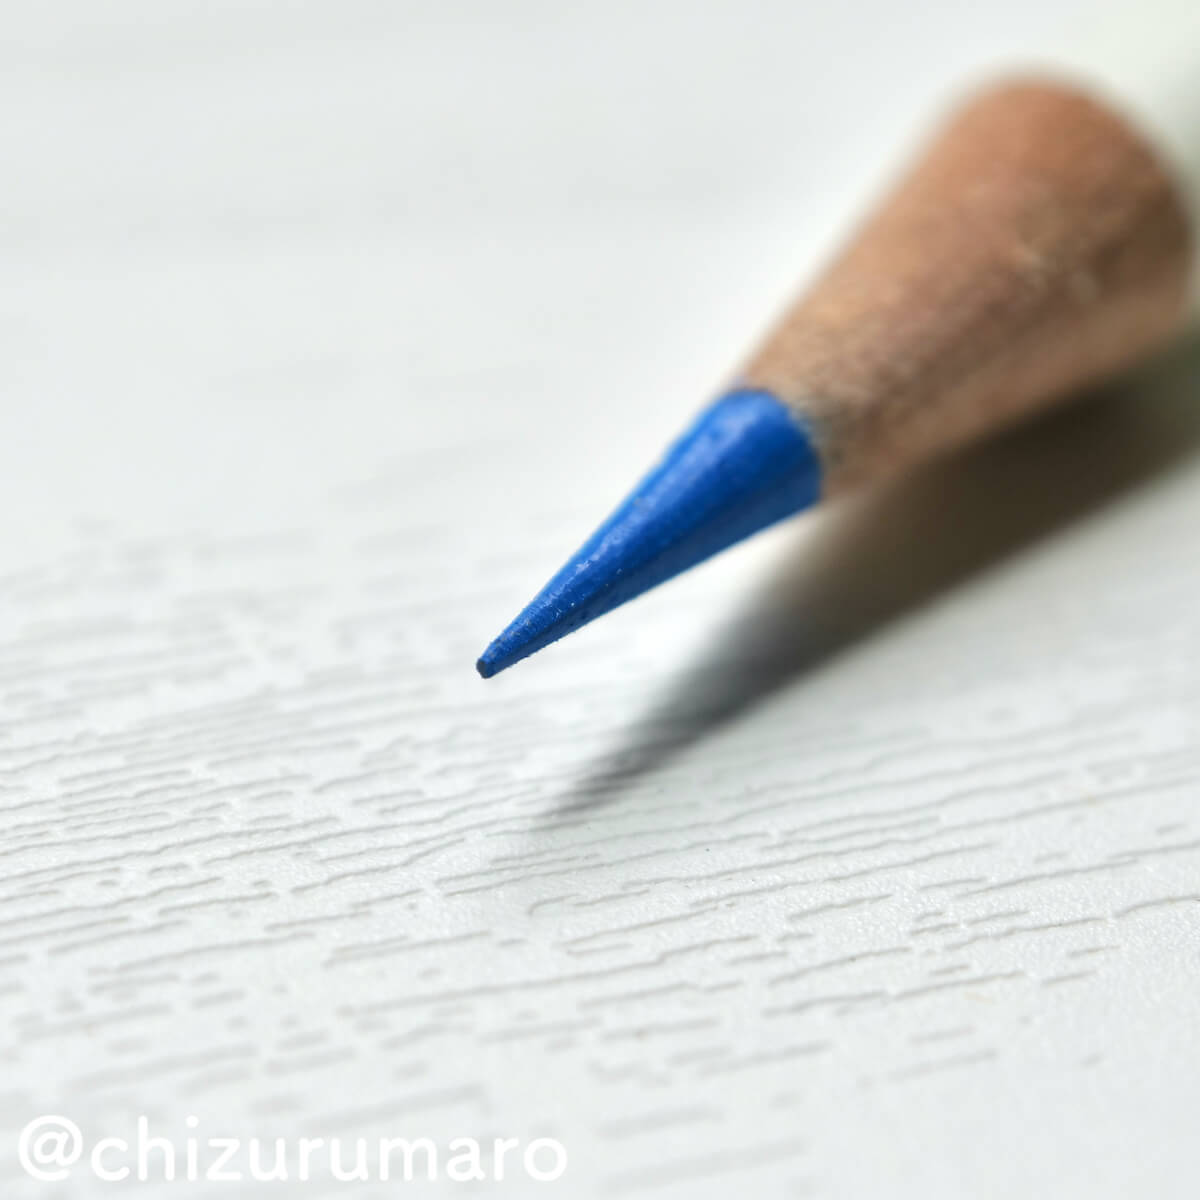 f:id:chizurumaro:20210325210255j:plain